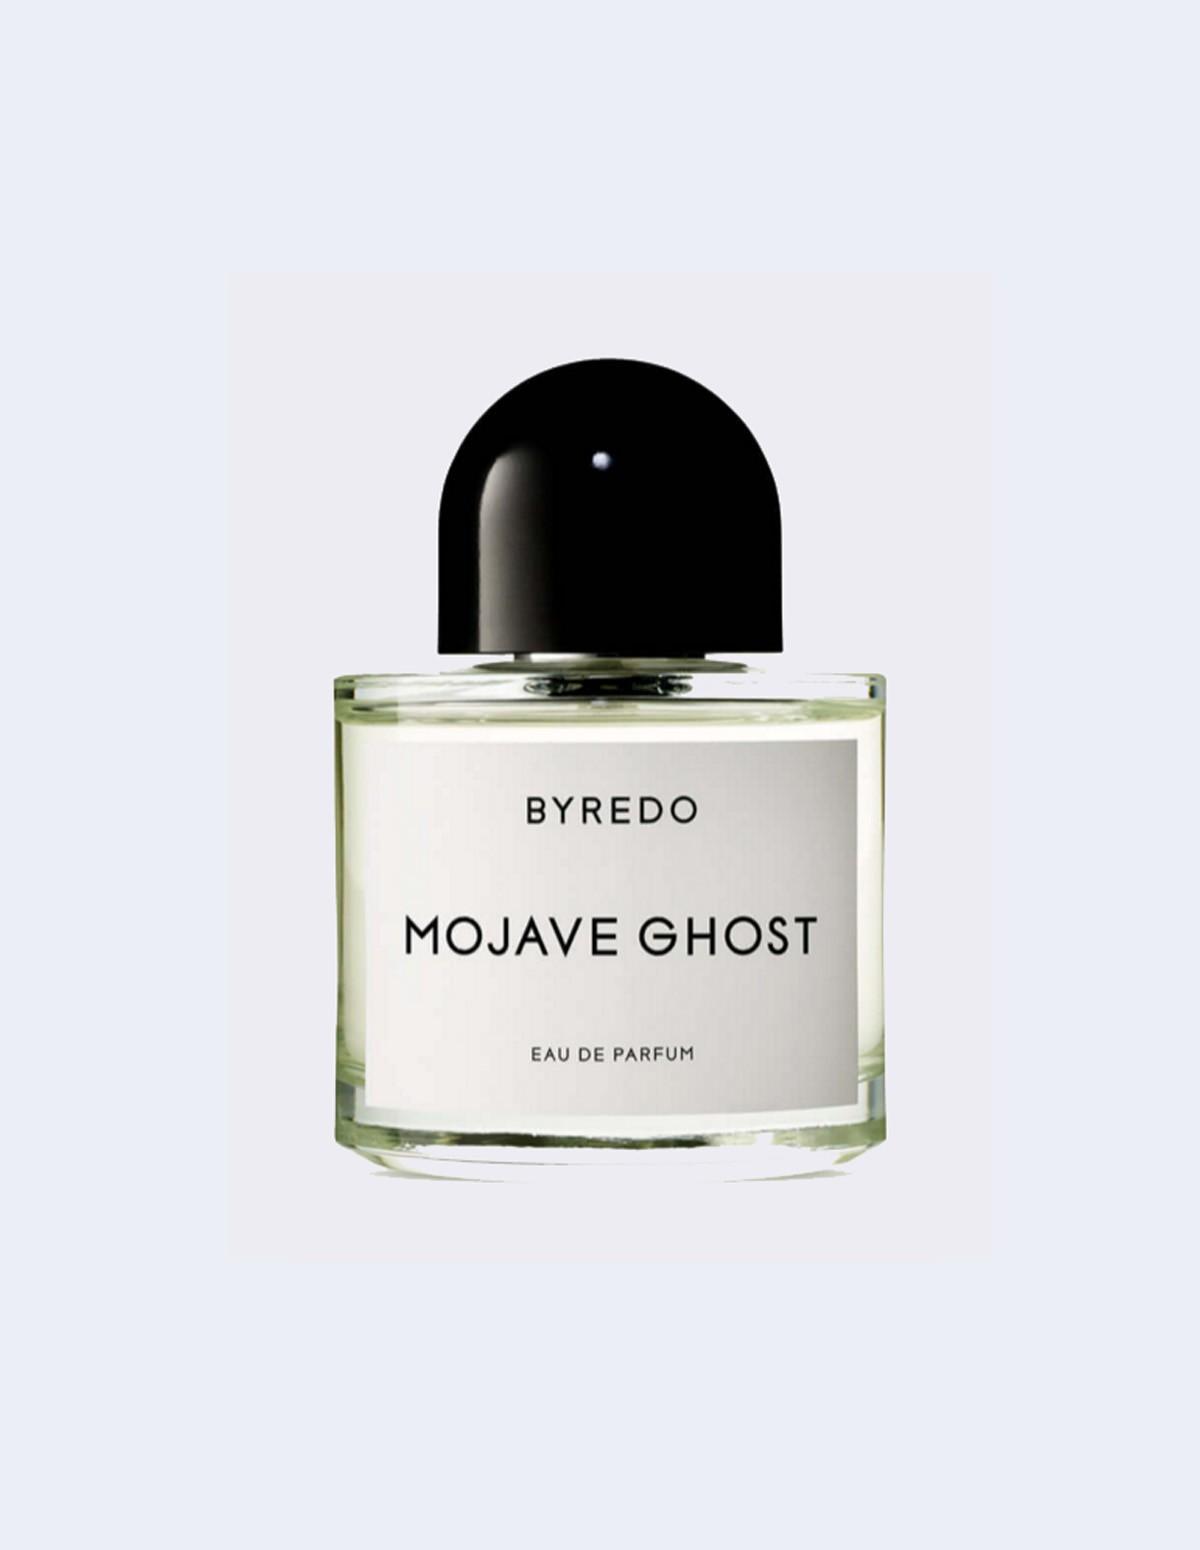 Byrdo Mojave Ghost